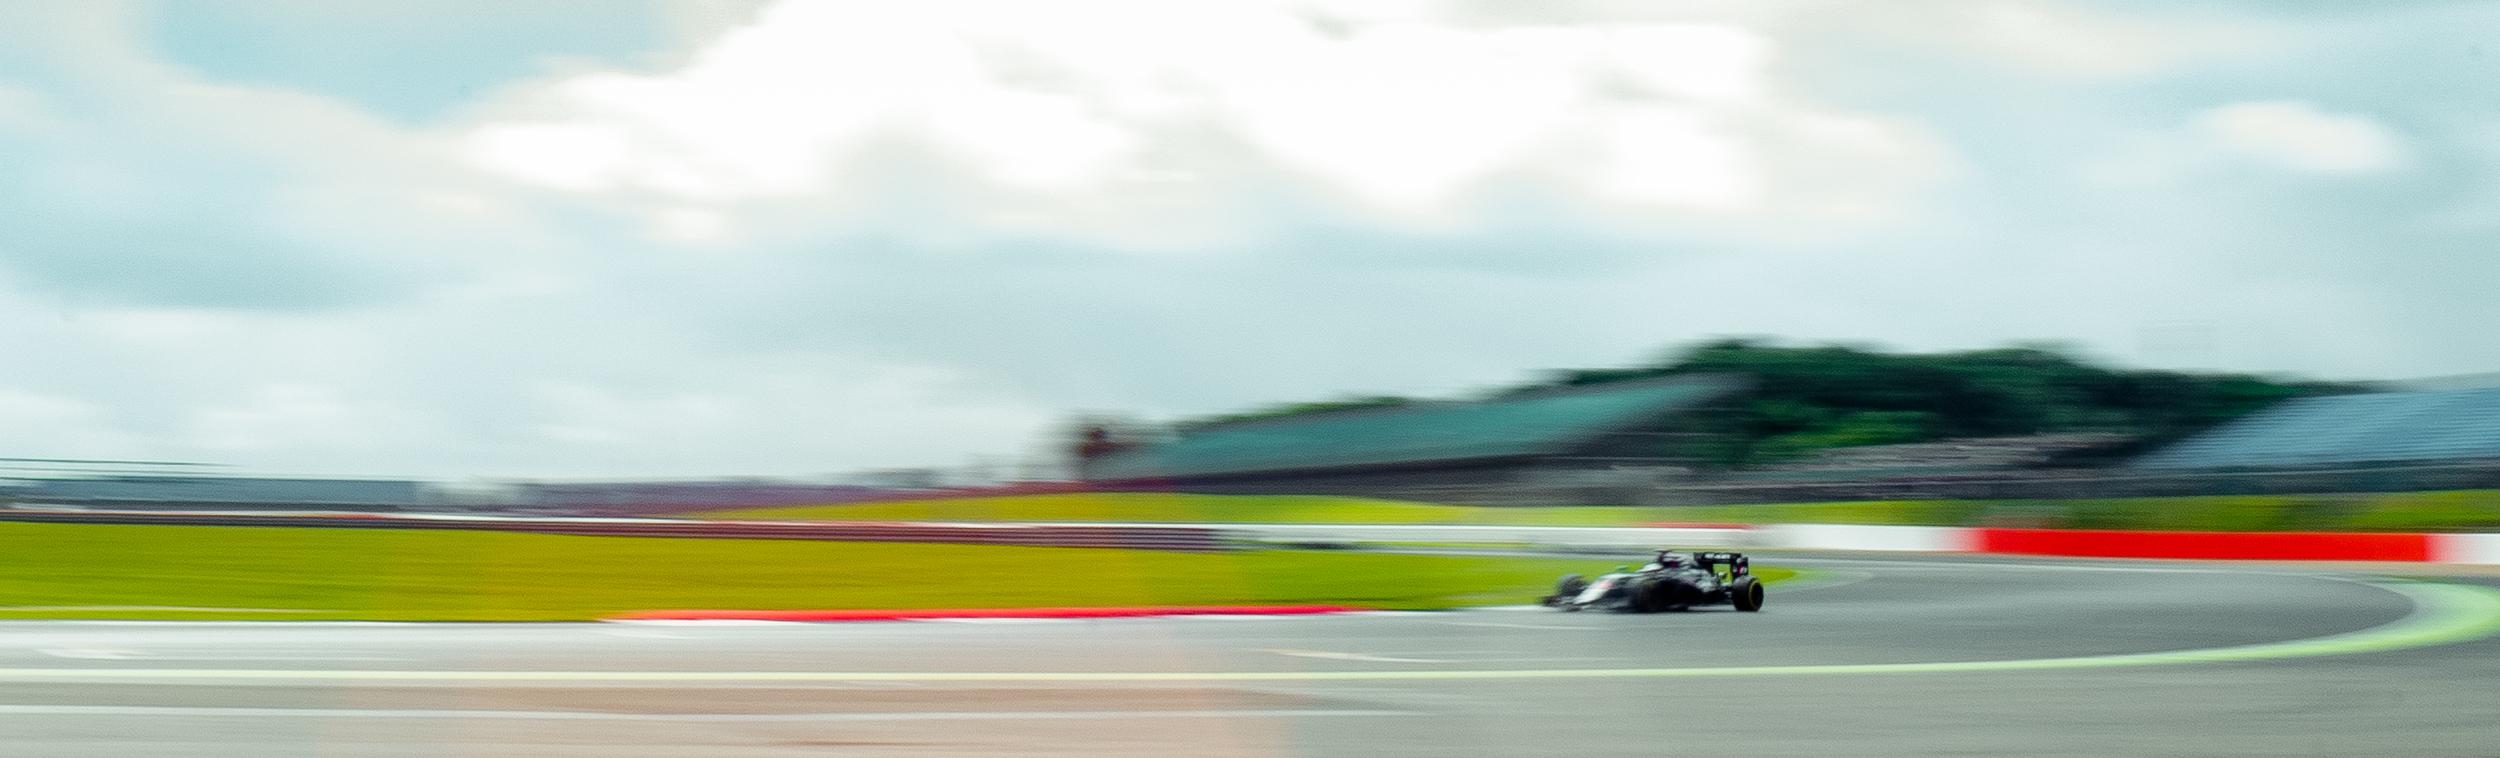 Fernando Alonso Nikon D750 x 24mm Sigma Super Wide